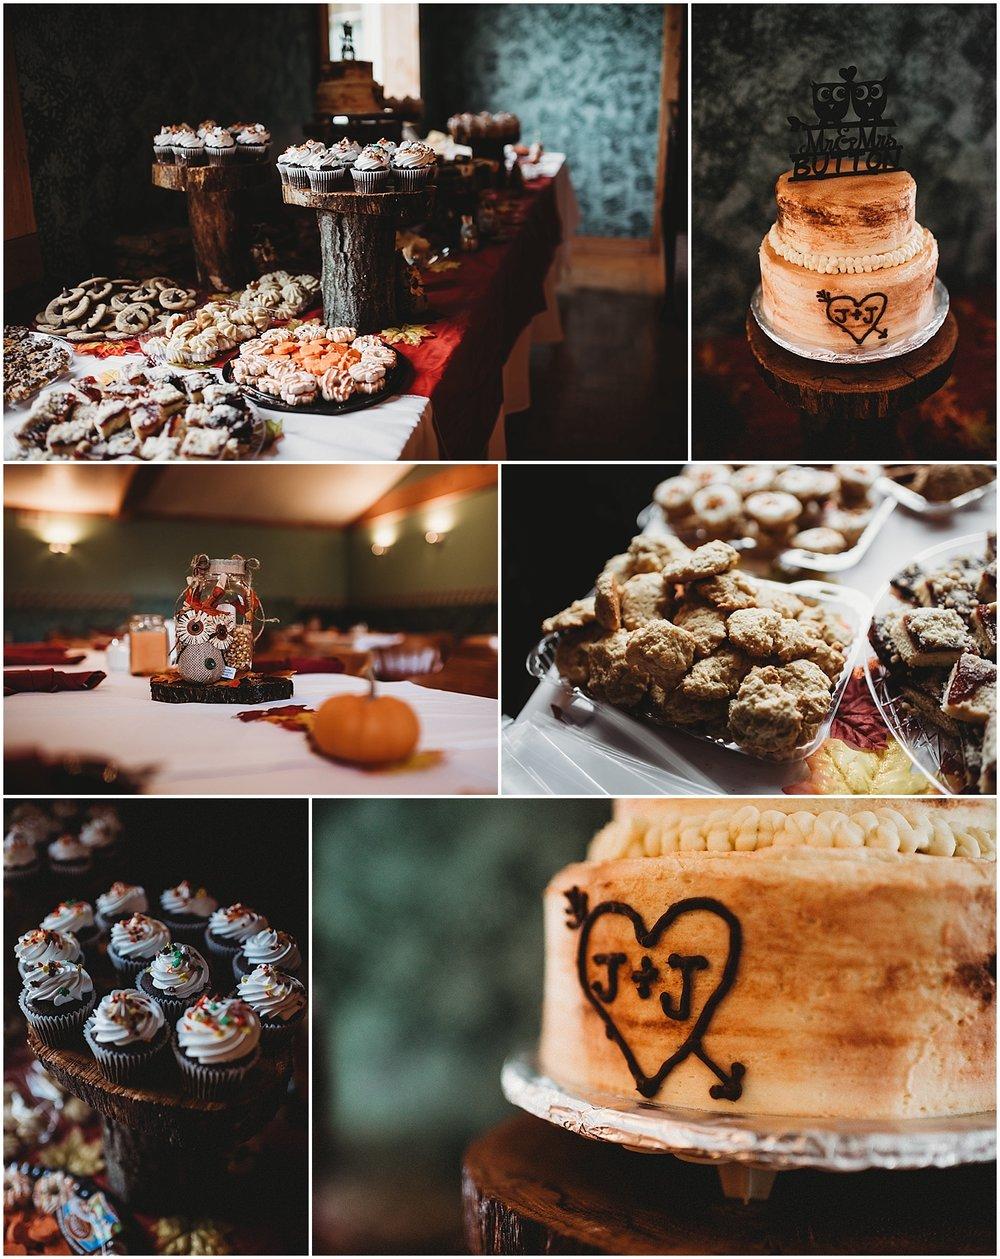 NEPA-Scranton-Sandals-Southcoast-wedding-engagement-photographer-in-Philadelphia-PA-Central-PA_0076.jpg